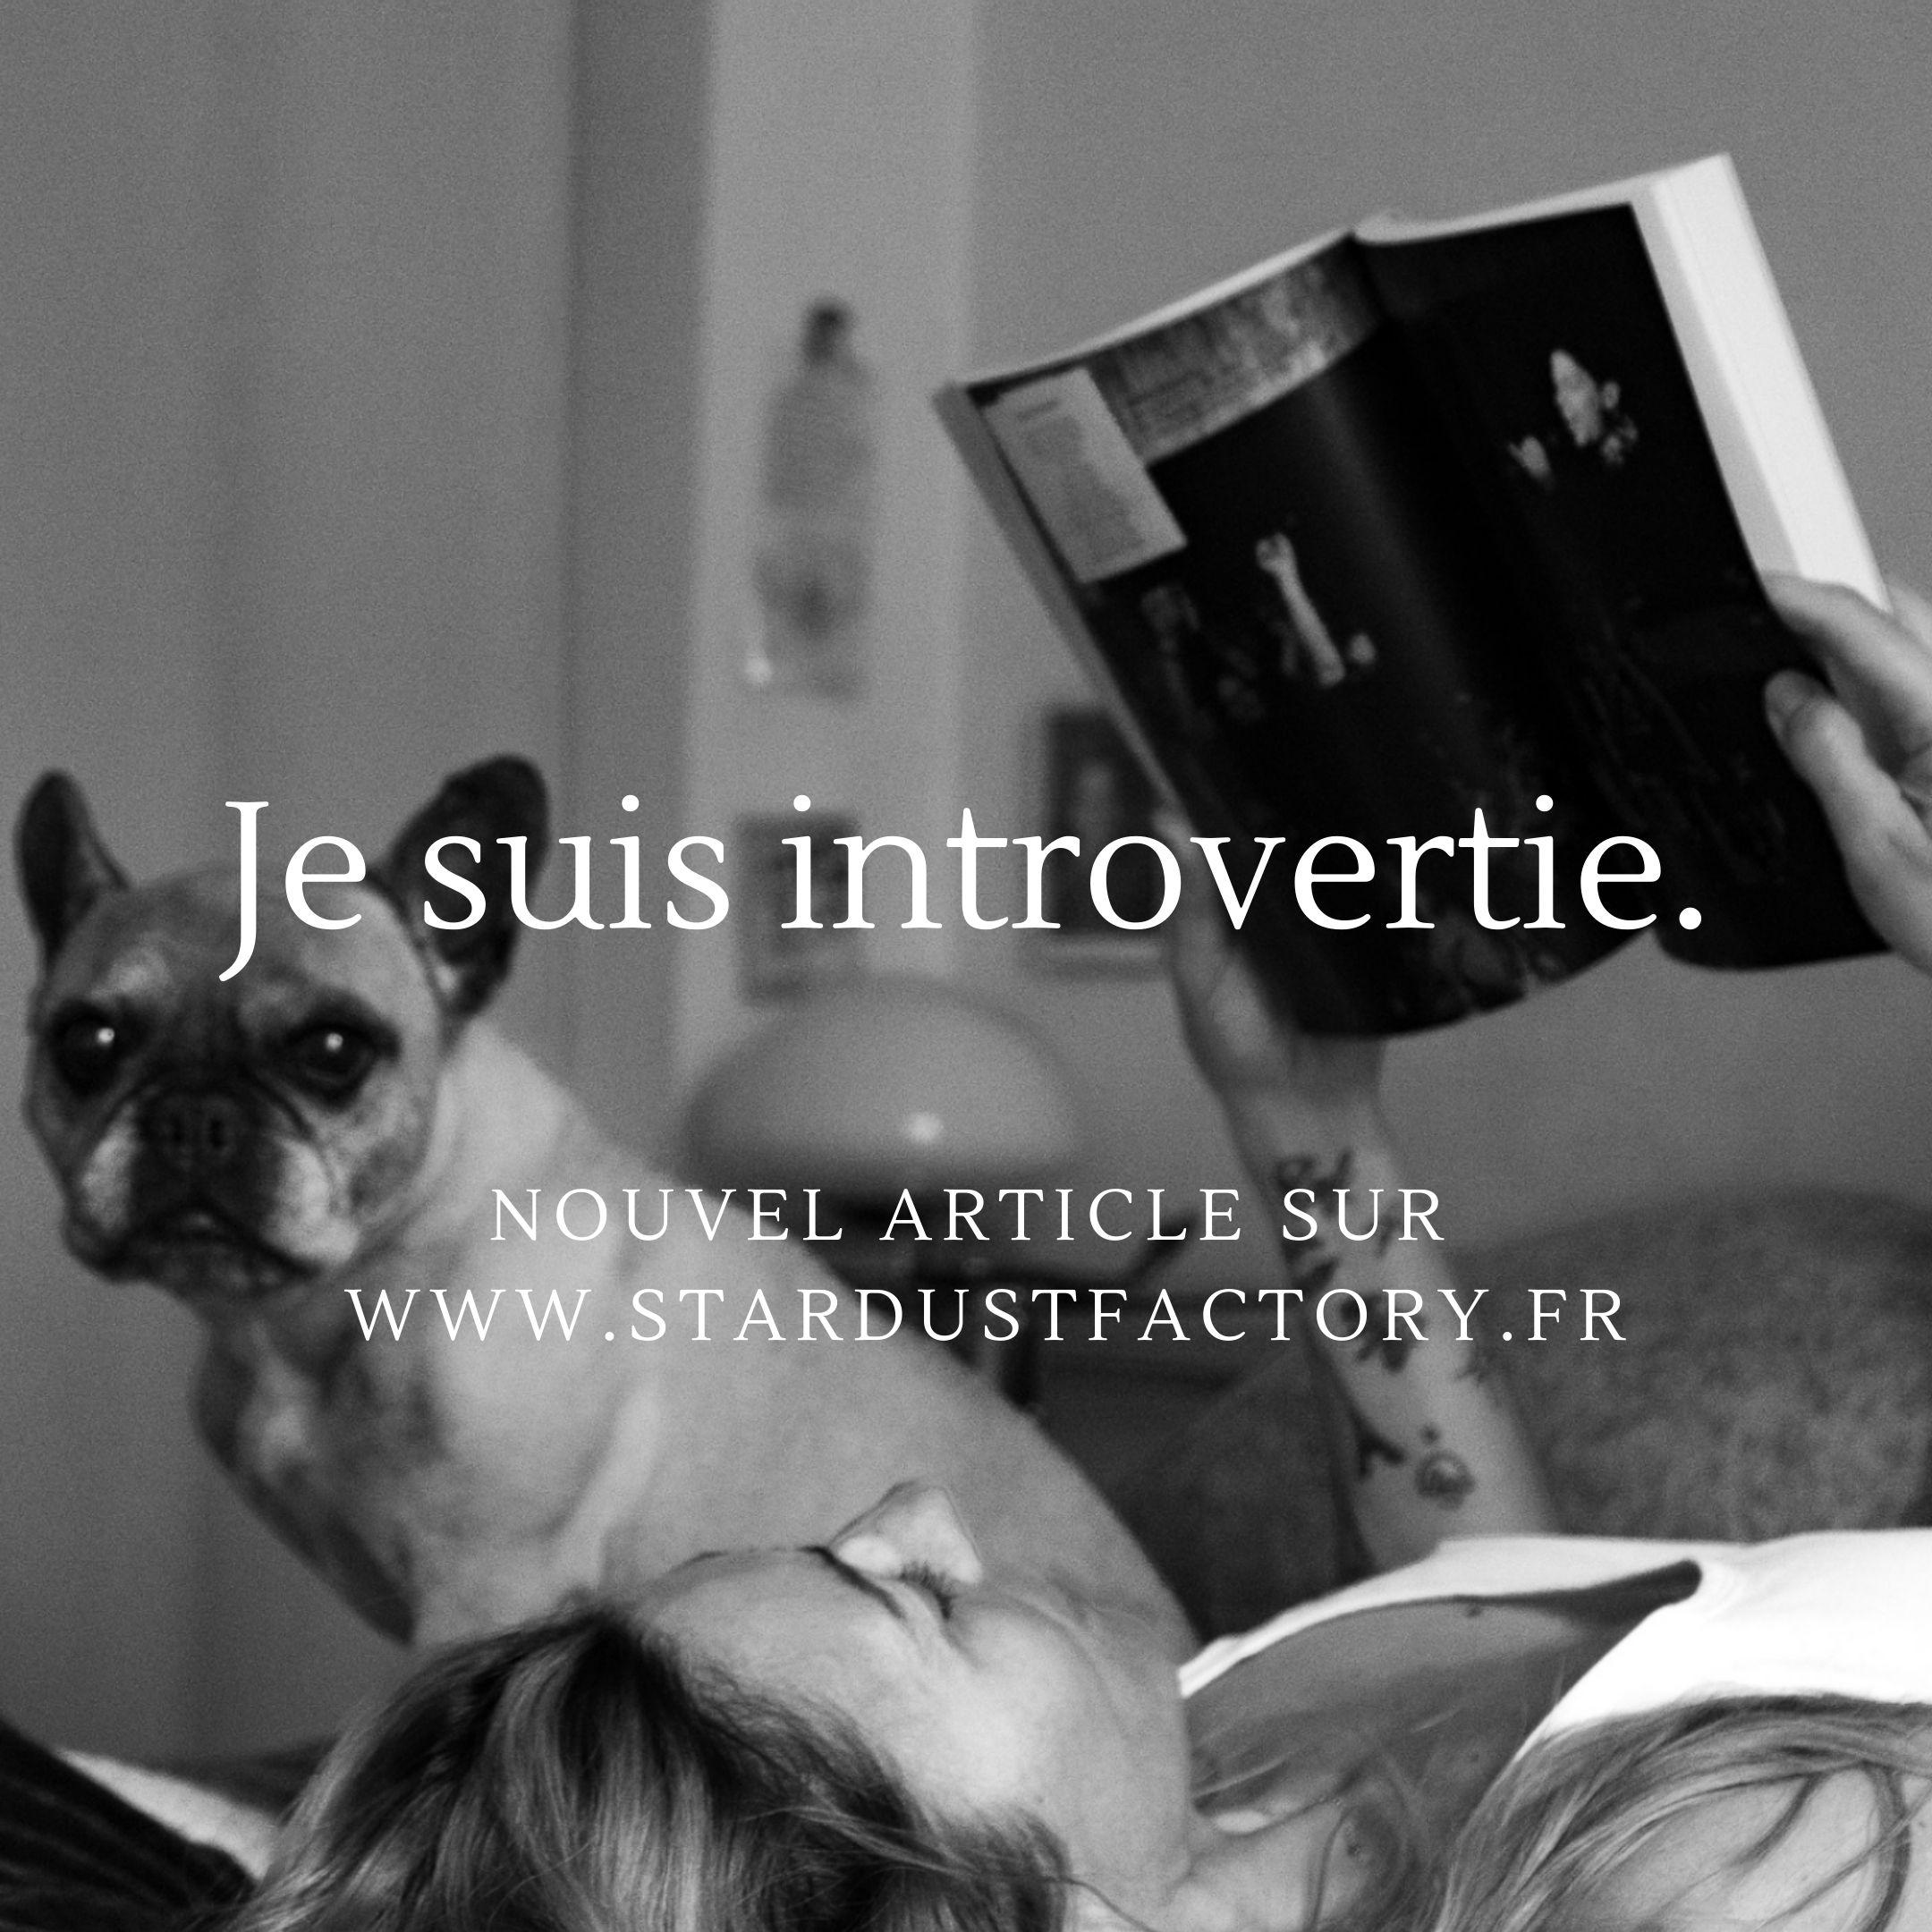 Je suis introvertie